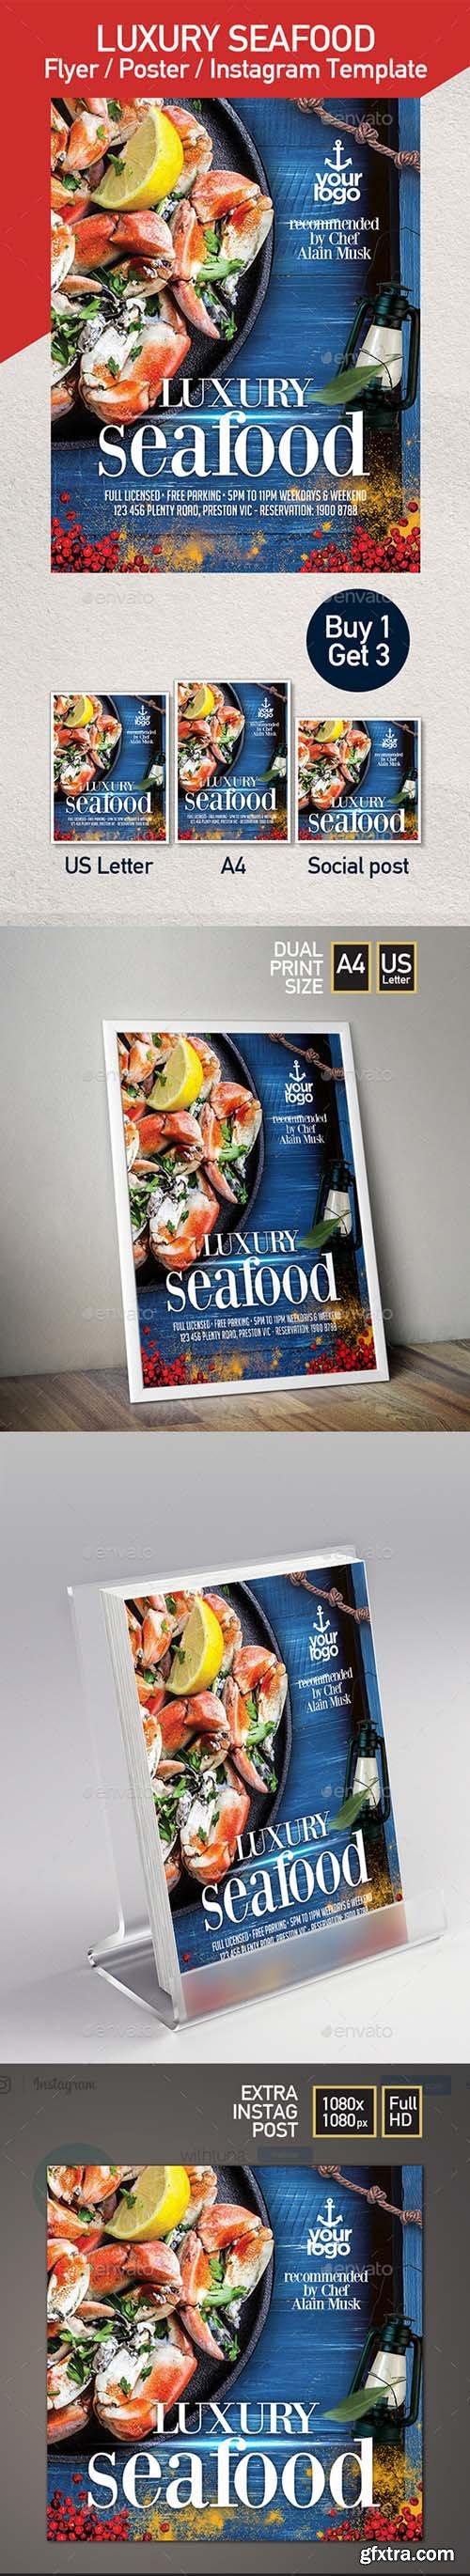 Seafood Restaurant - Set of 3 Flyer Templates 22314497